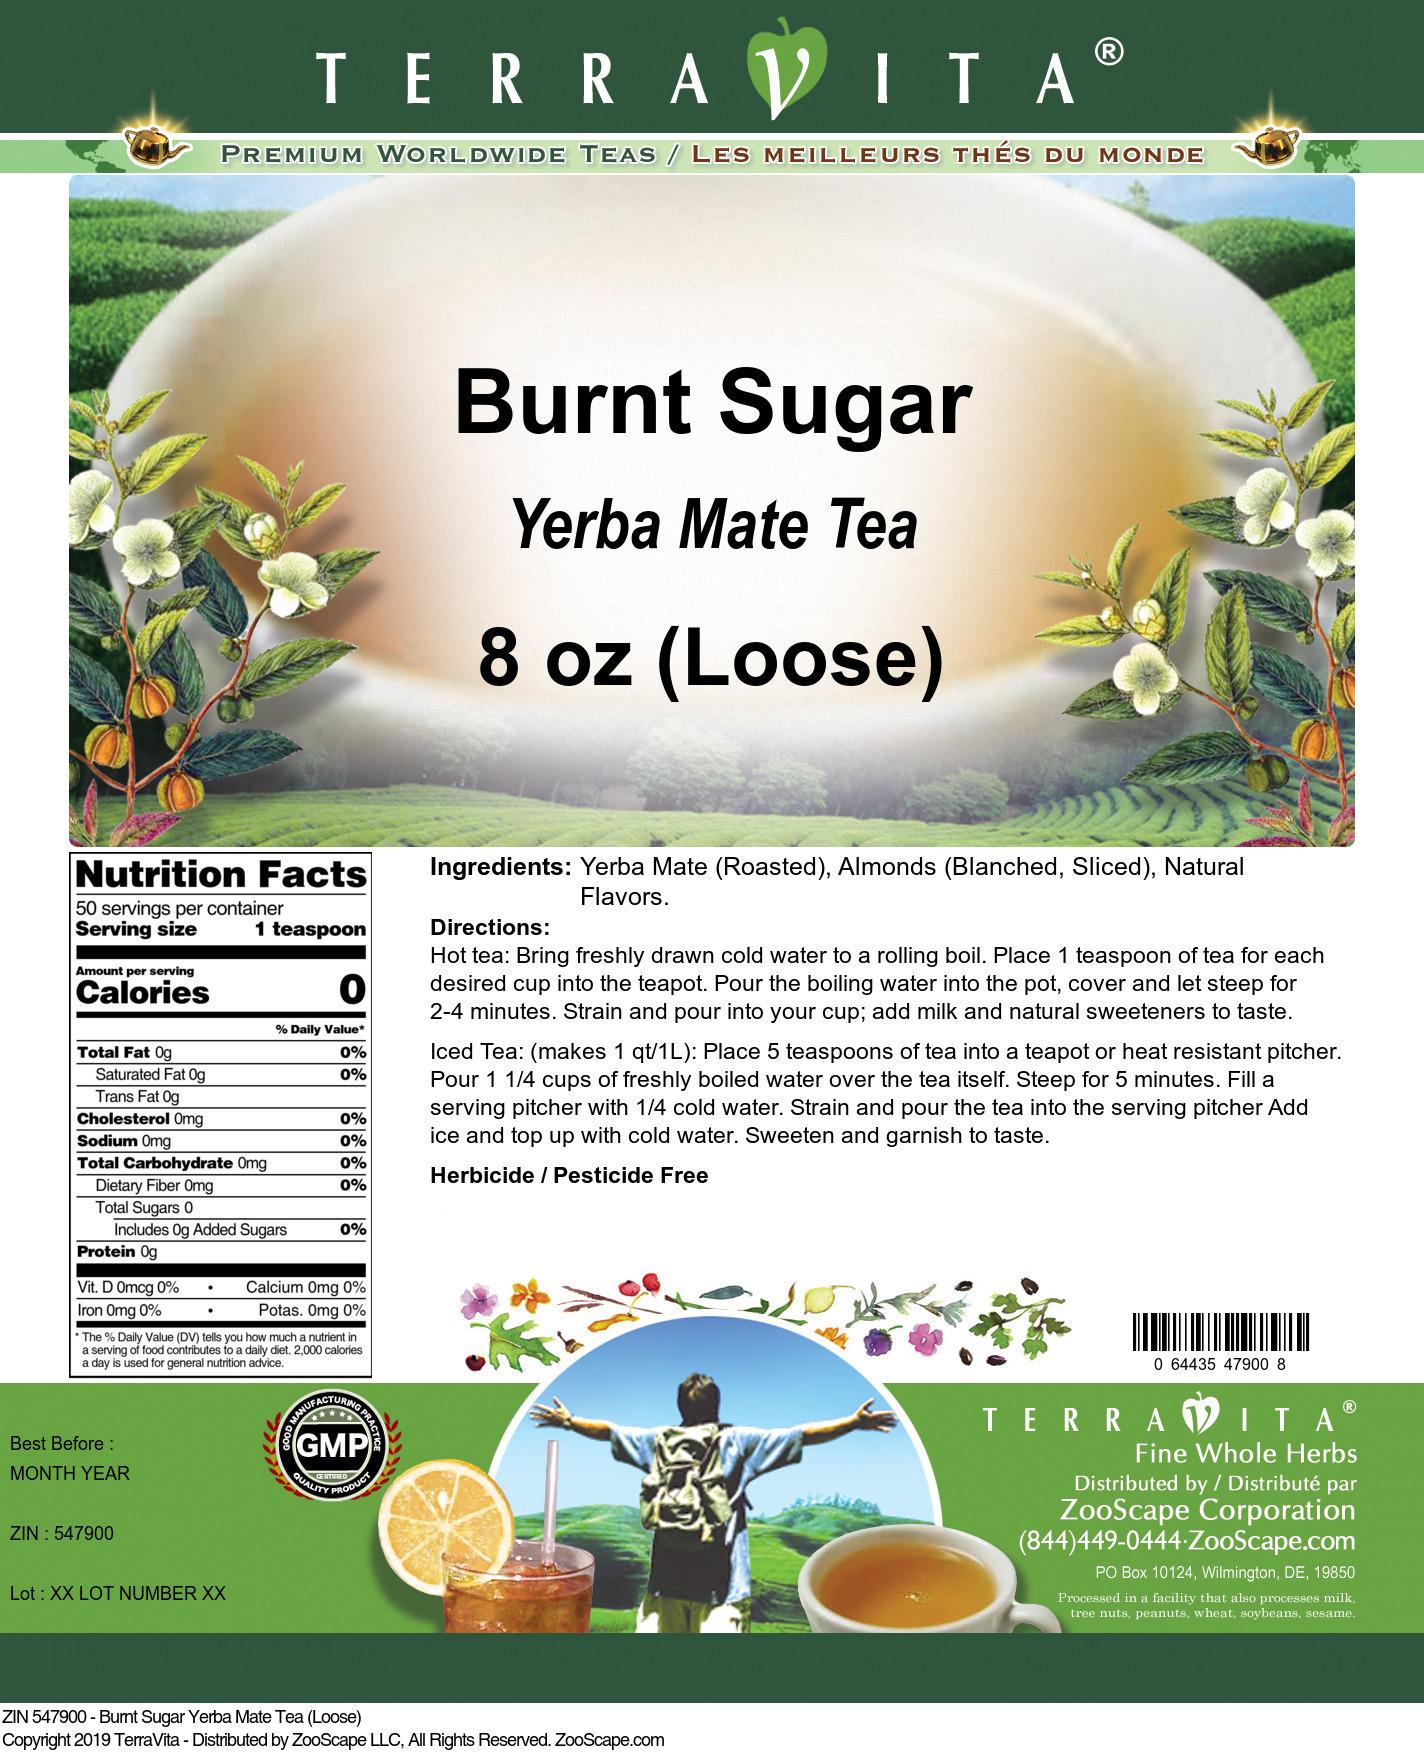 Burnt Sugar Yerba Mate Tea (Loose)